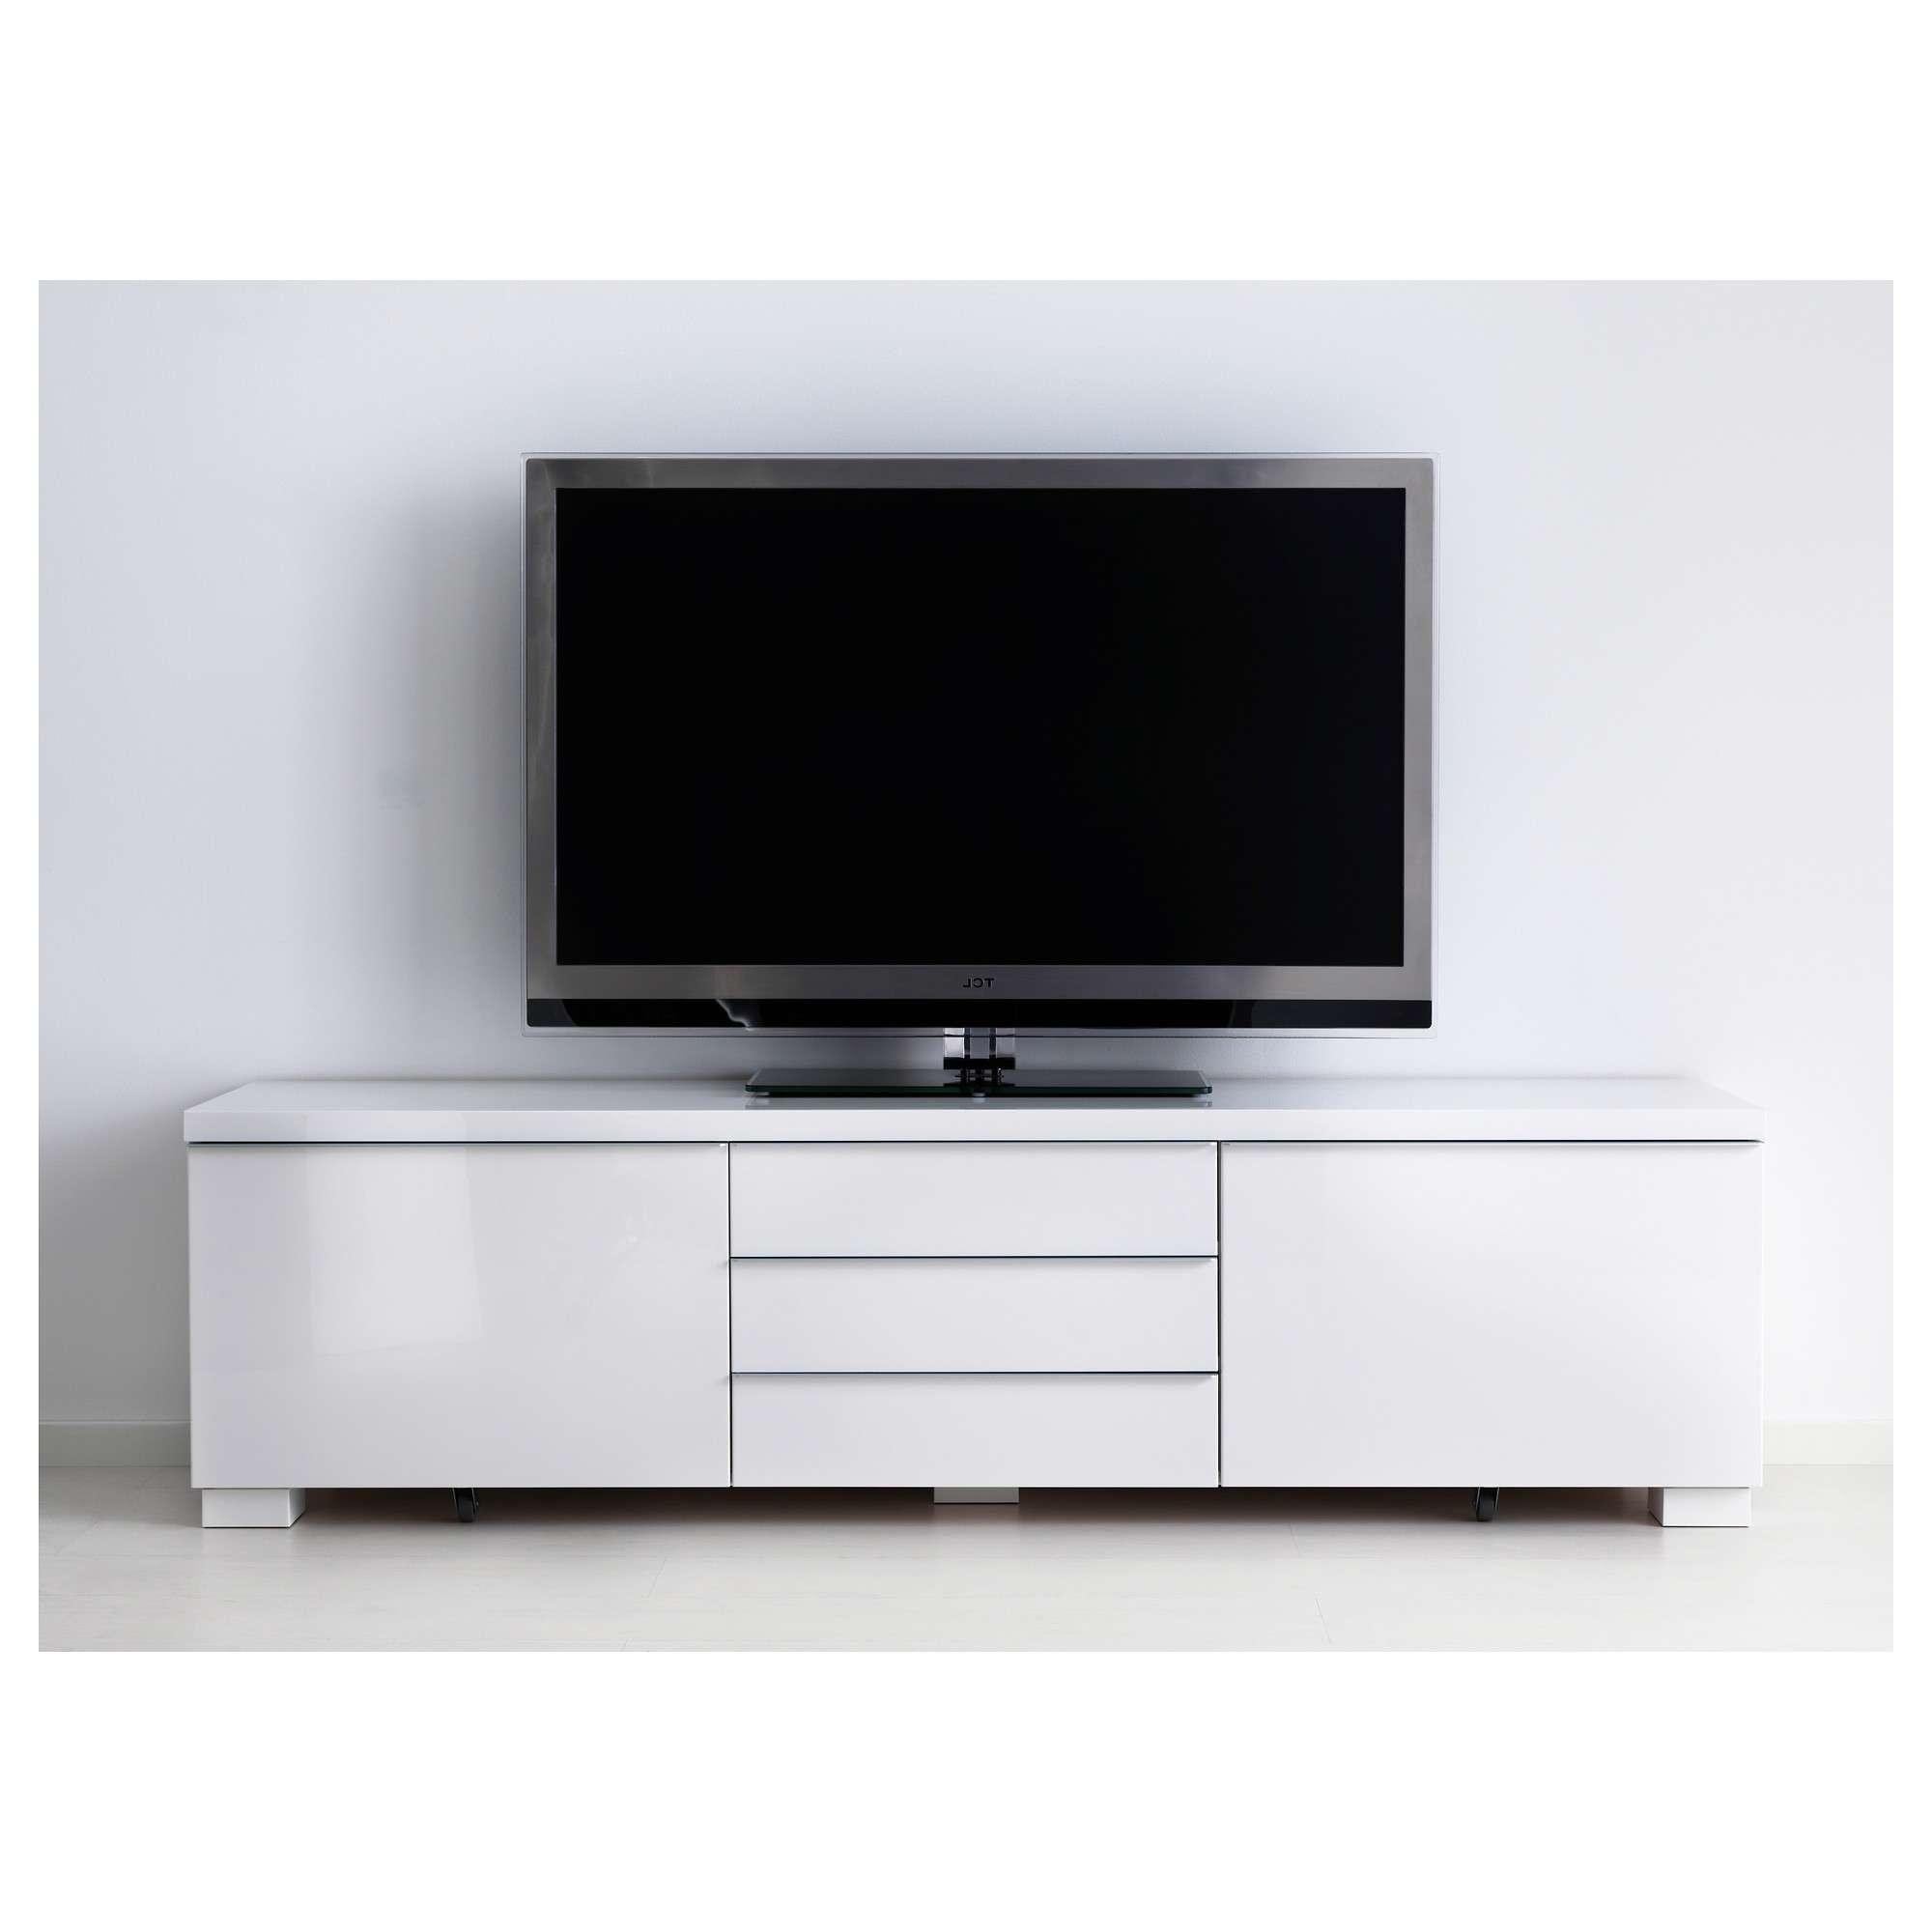 Bestå Burs Tv Bench High Gloss White 180X41 Cm – Ikea For White Tv Cabinets (View 2 of 20)